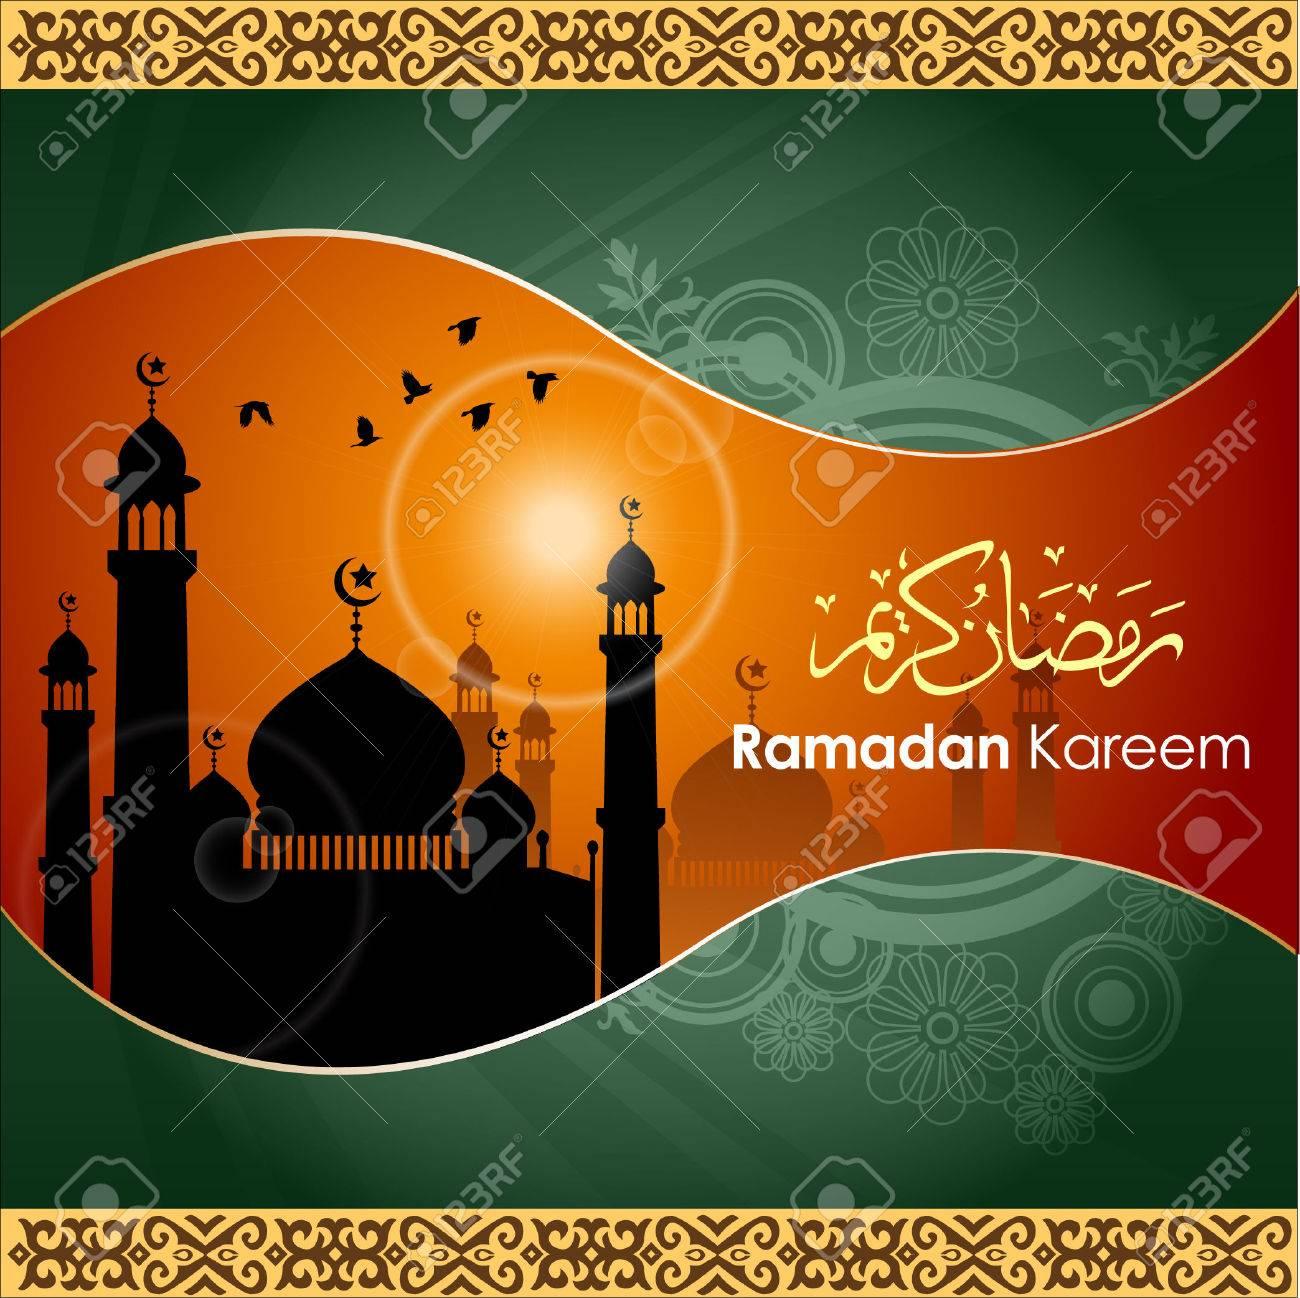 Поздравление на рамадан на татарском